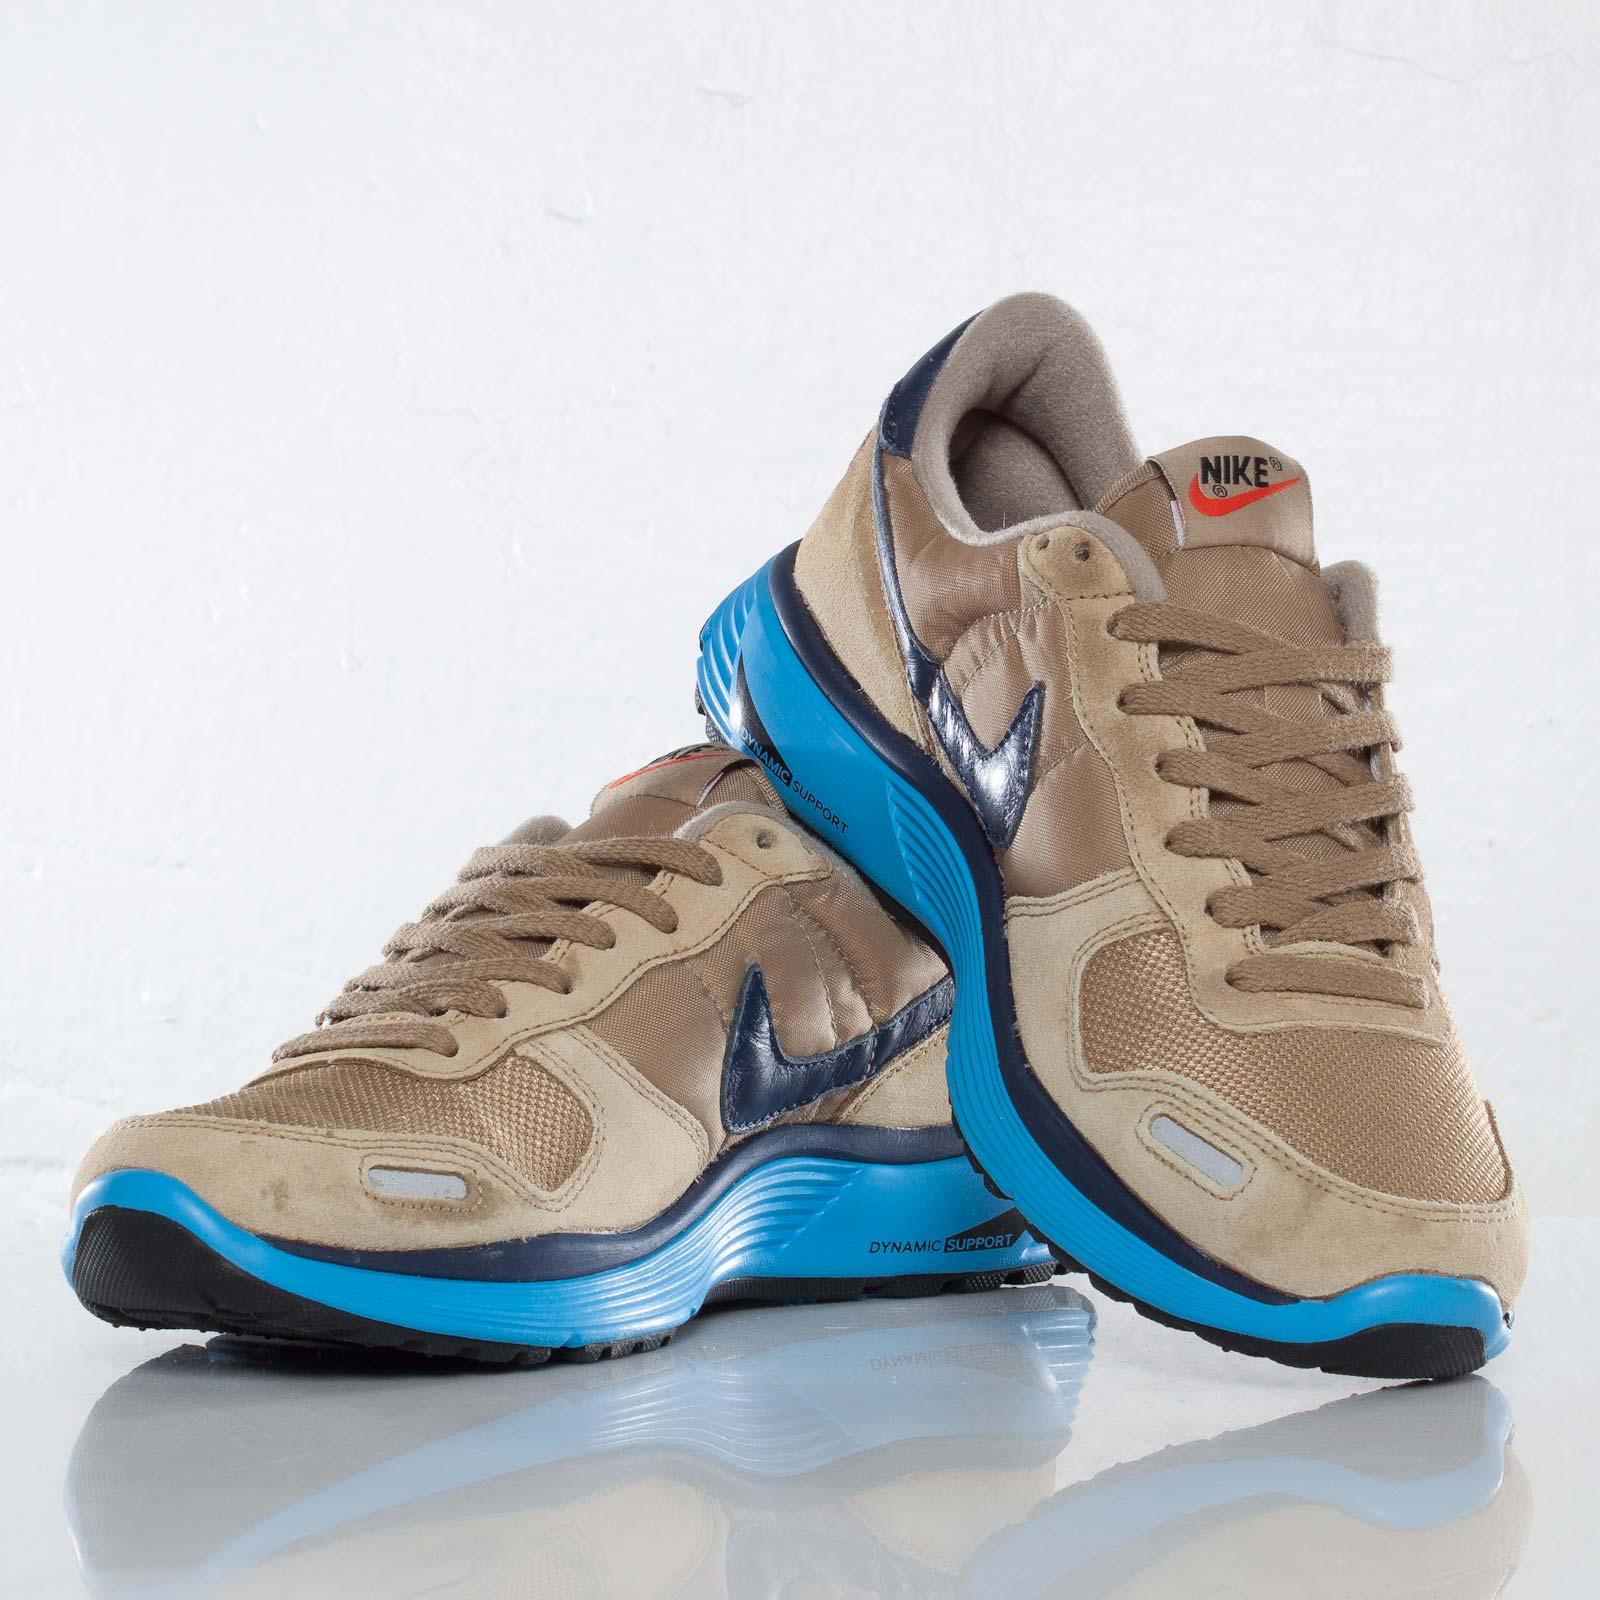 Nike Vortex Vintage Lunar (+) NRG - 559710-240 - Sneakersnstuff ... 78e95103eb7a